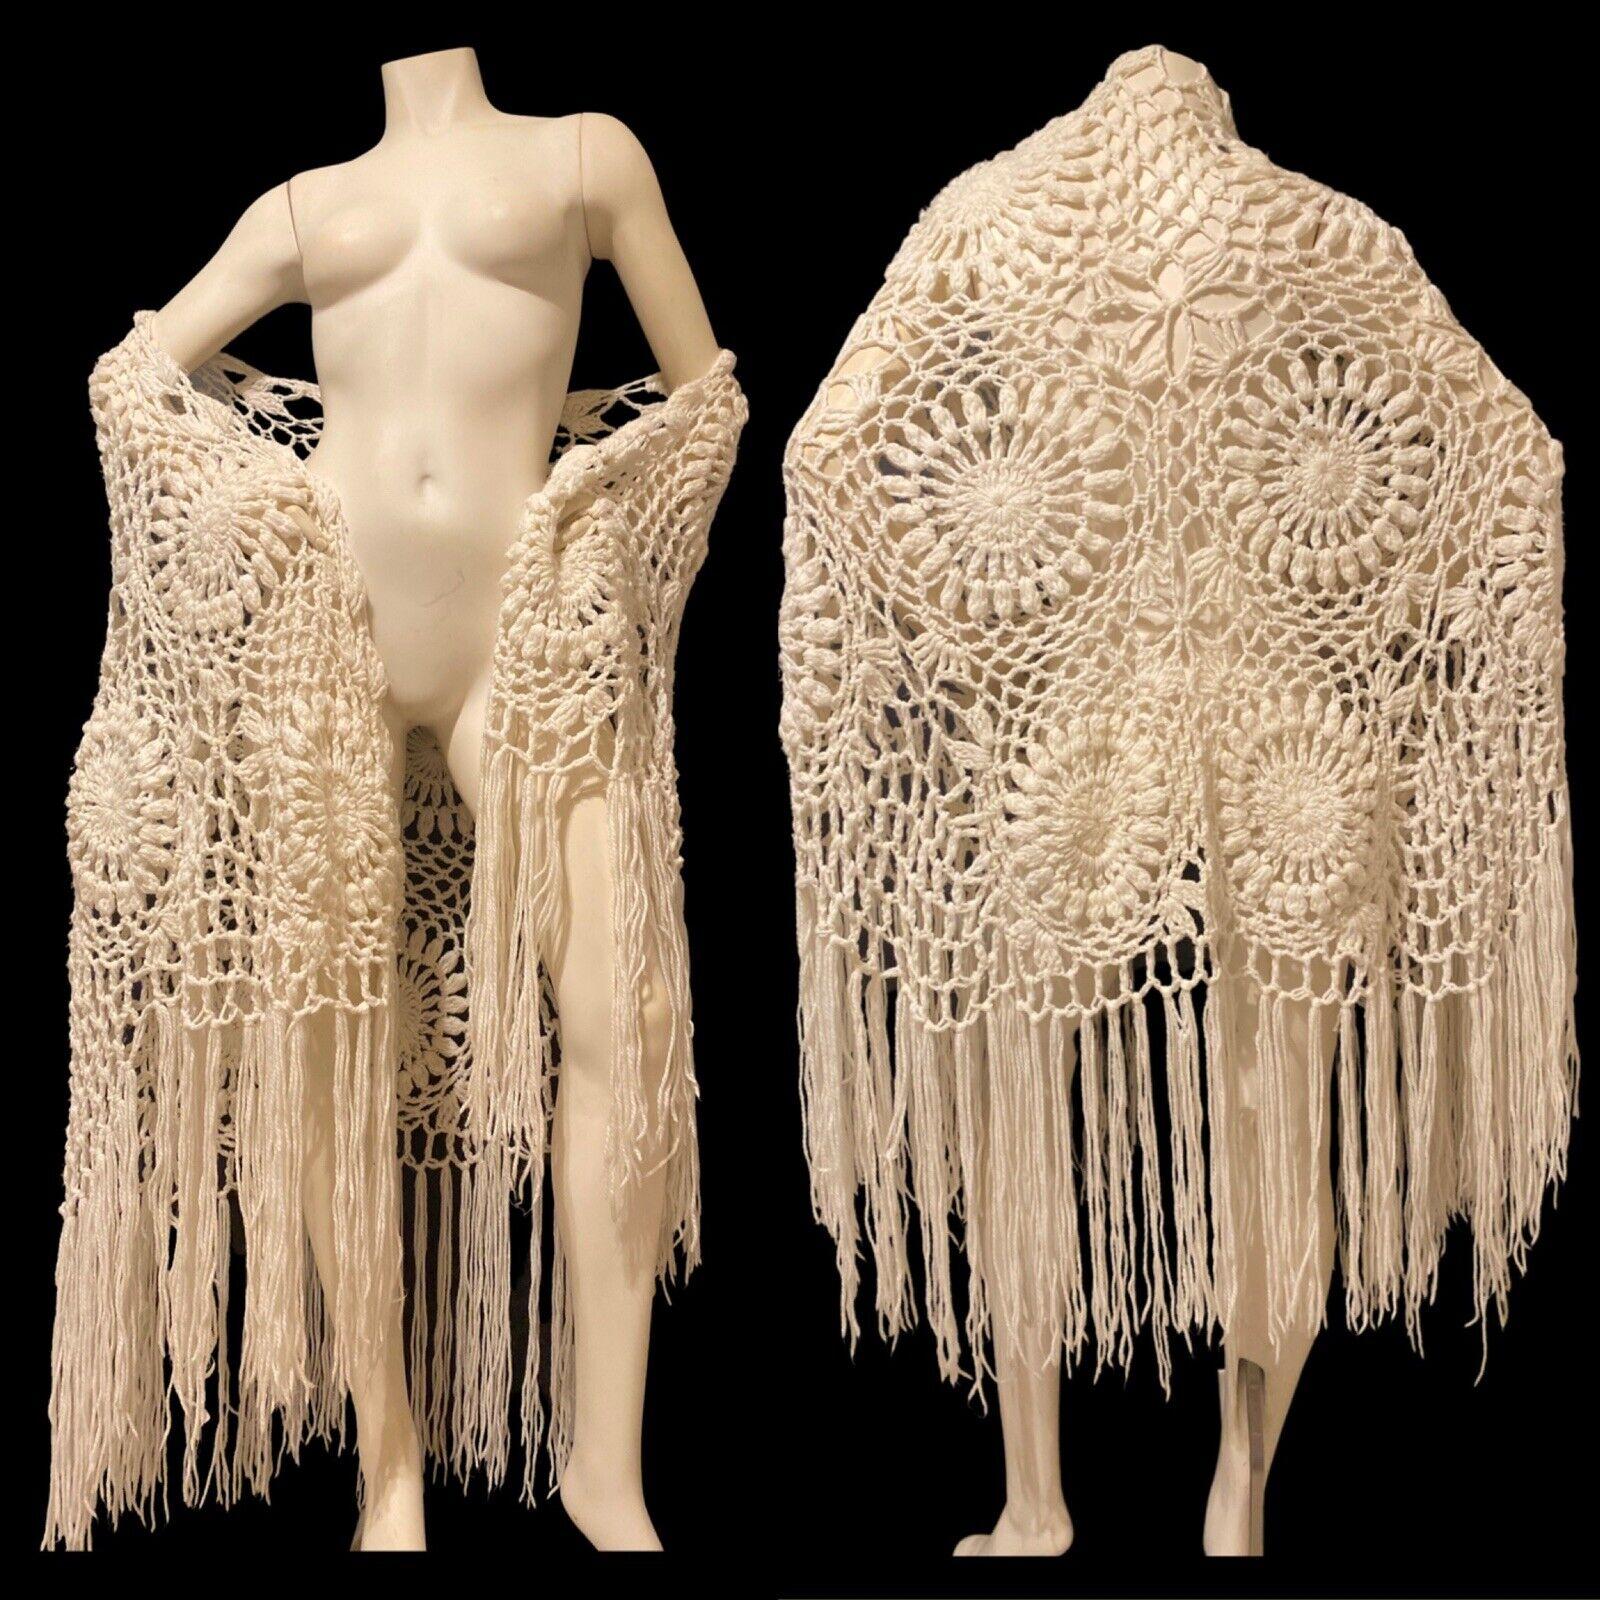 OSFM 1970s White Open Crochet Shawl Wrap Fringe Trim Bohemian Boho Hippie 70s